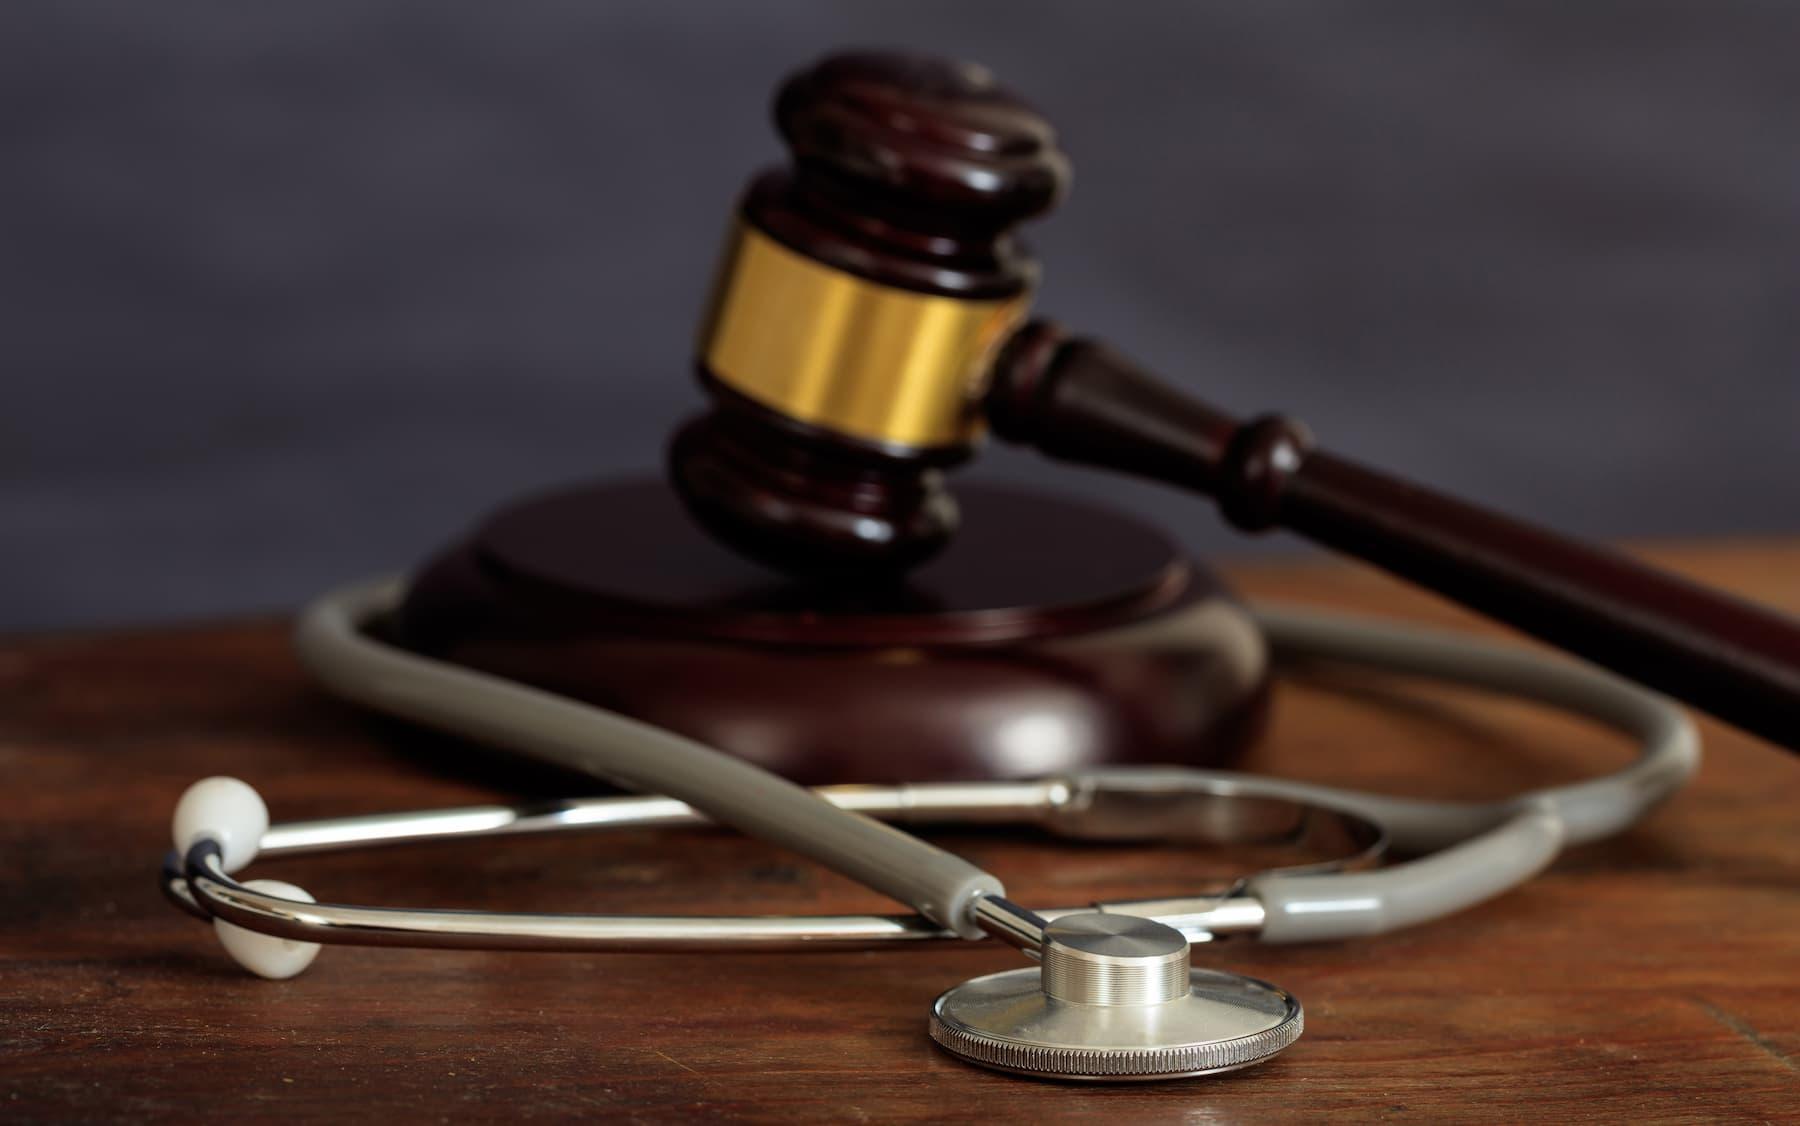 Stethoscope and judge's gavel